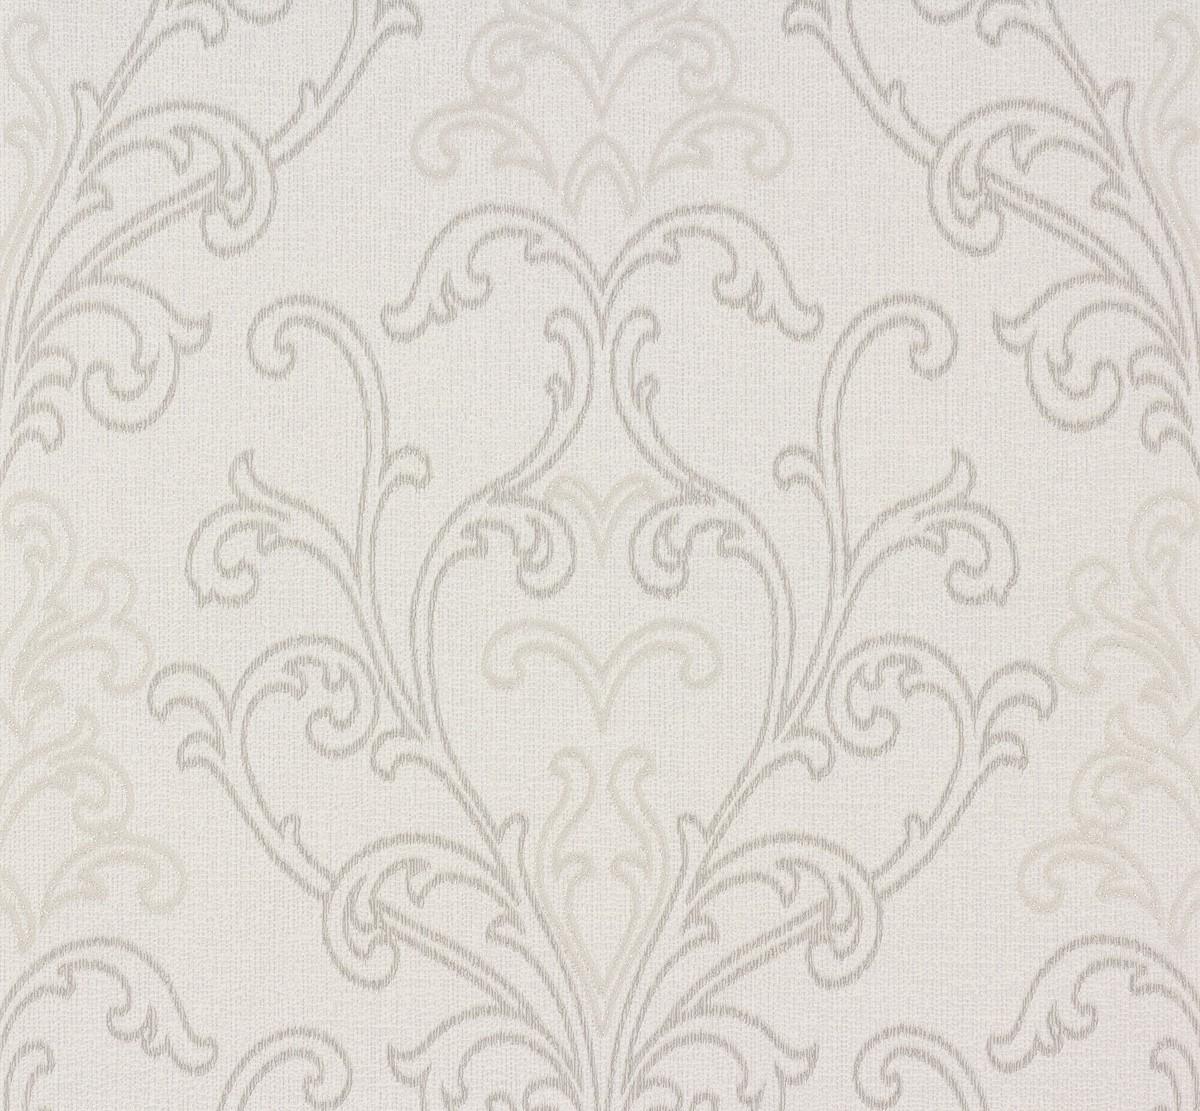 Tapete weiß ornamente  Tapete weiß grau Ornamente Voyage Erismann 6978-31